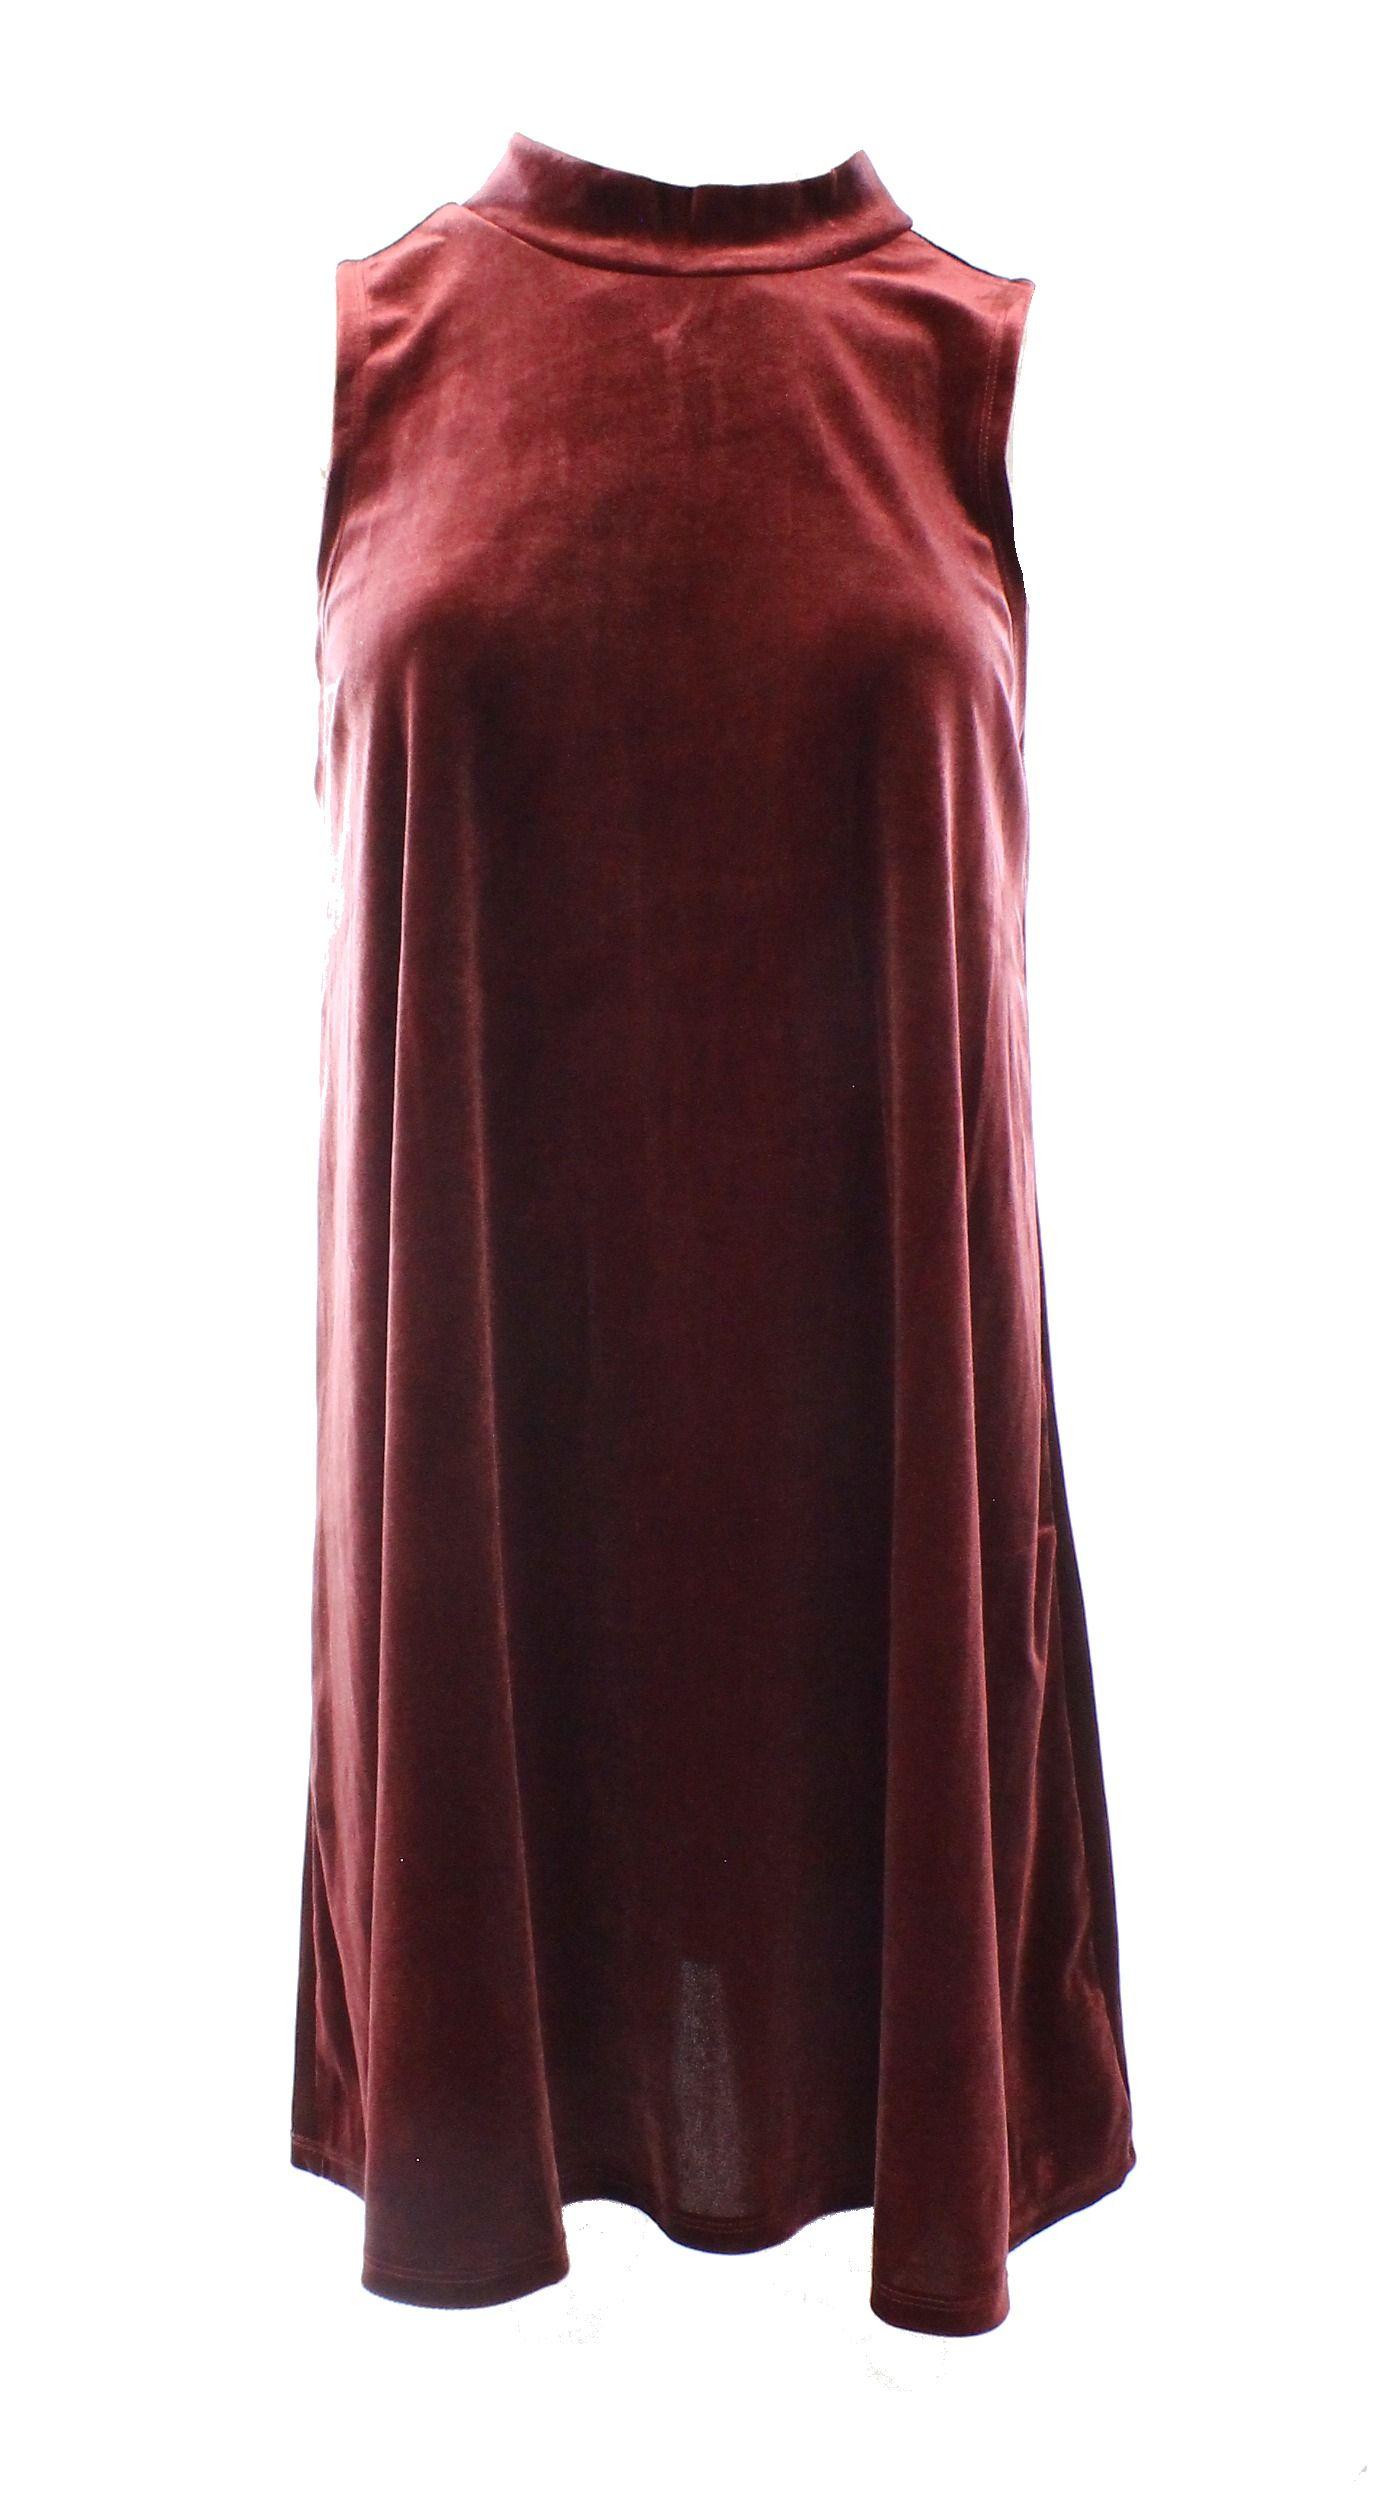 One Clothing NEW Red Burgundy Women's Large L Junior Velour Shift ...